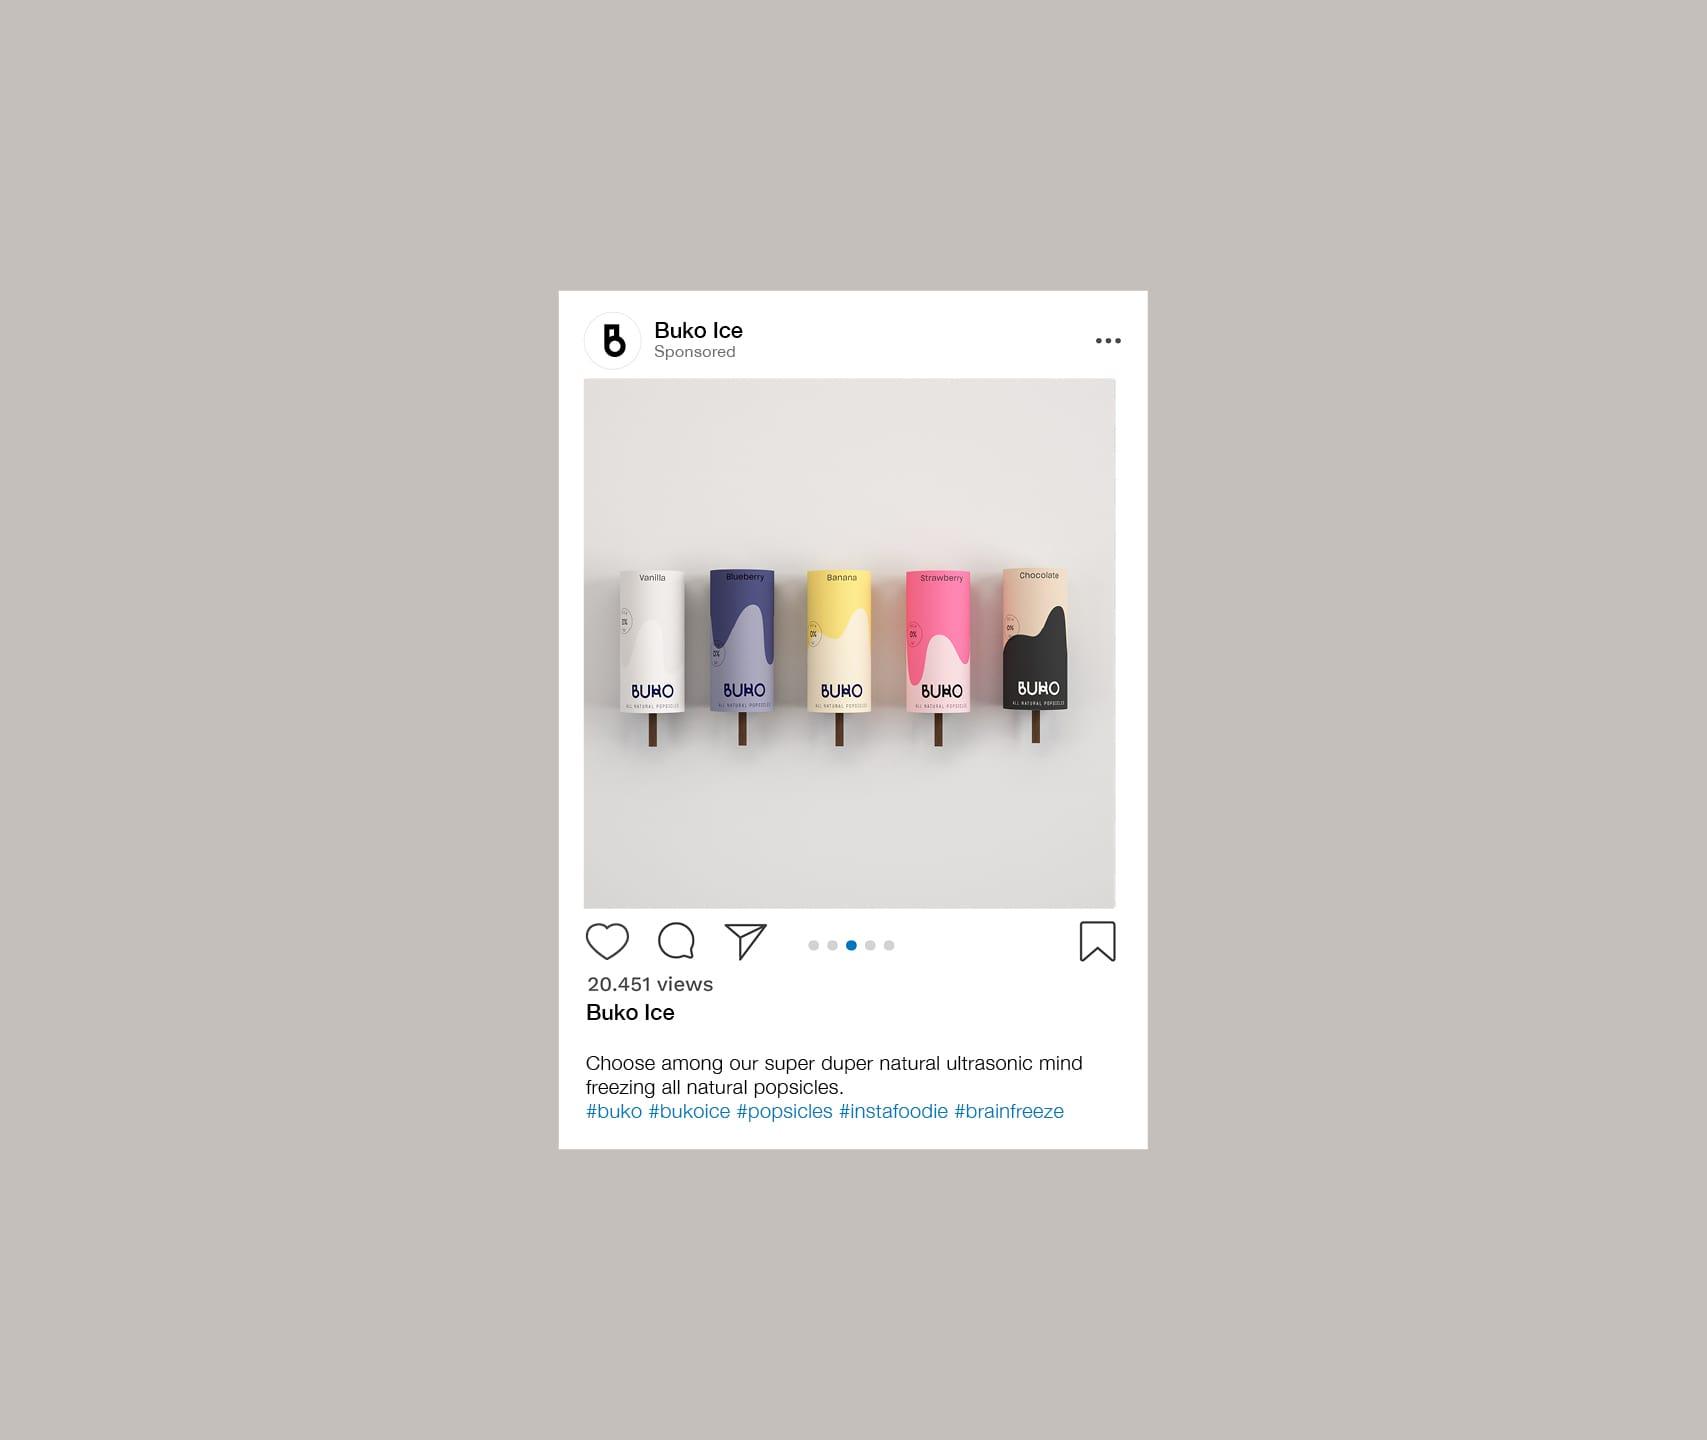 mantik-digital-creative-agency-branding-popsicle-icecream-packaging-experience-web-design-development16-min